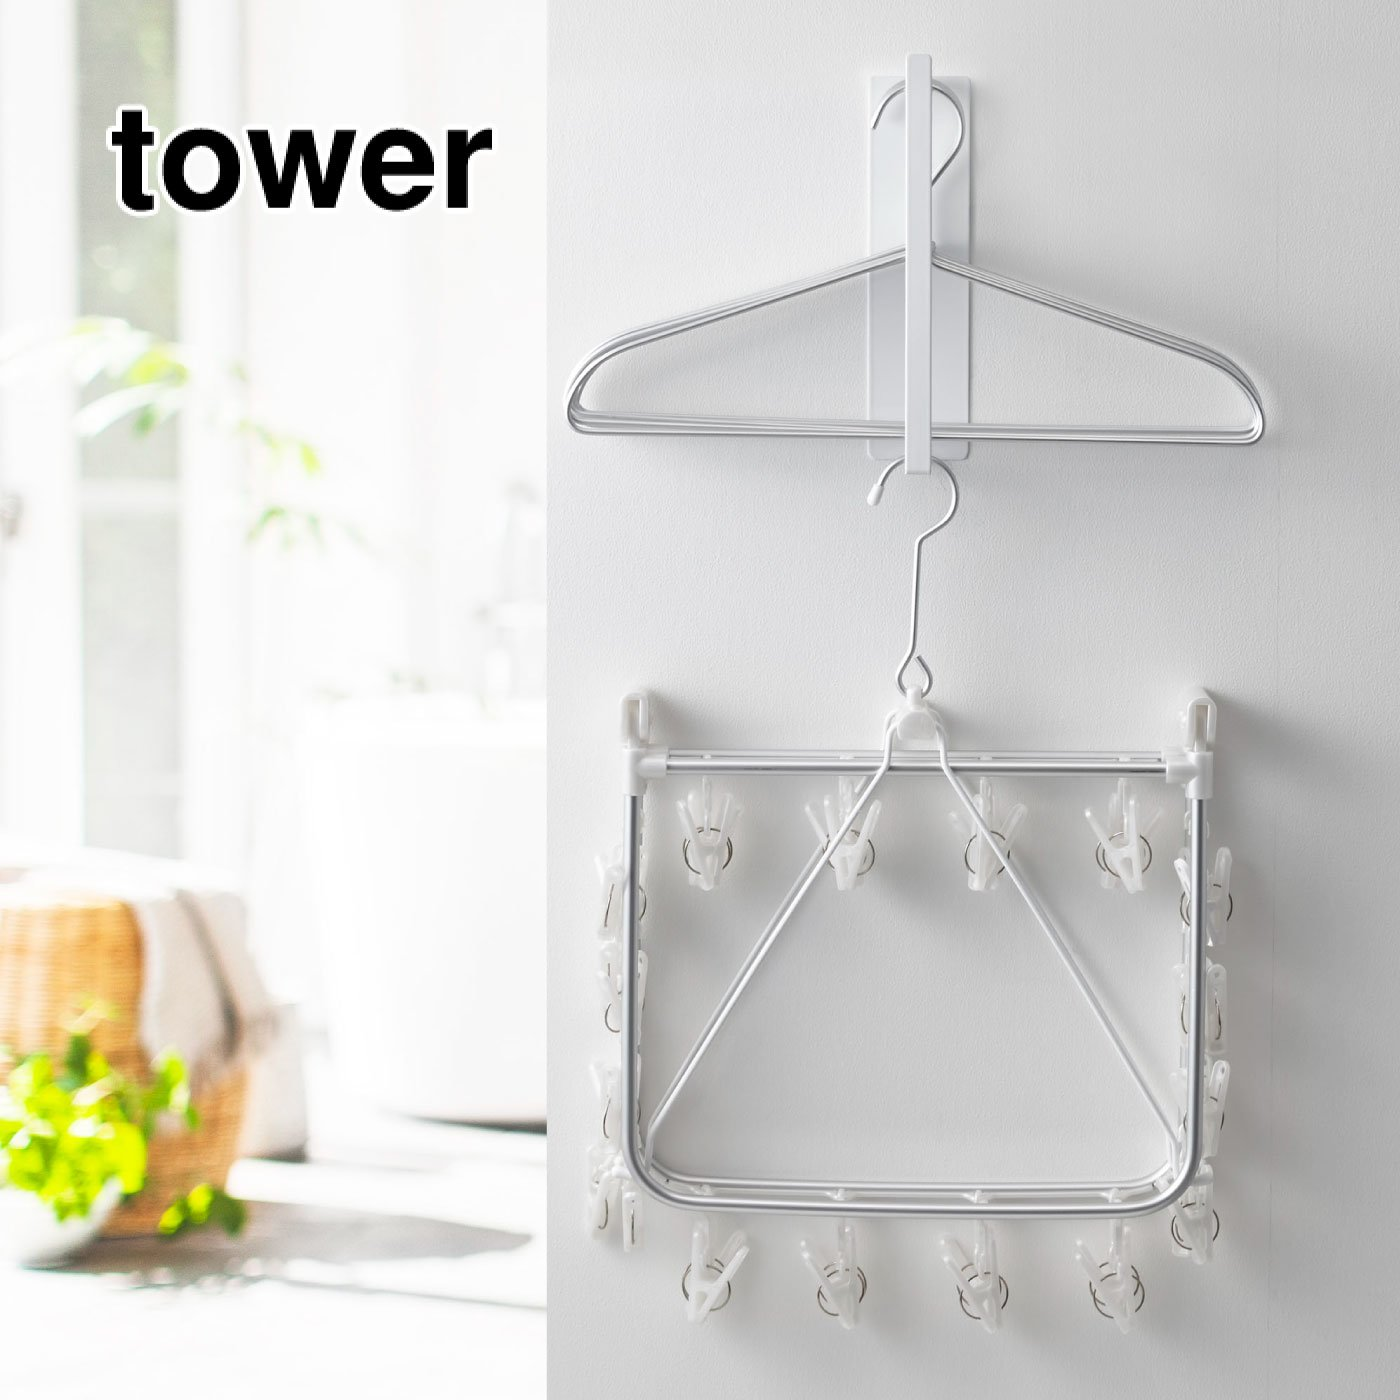 tower 使いかたいろいろ 便利なマグネット洗濯ハンガー収納フックプレートS